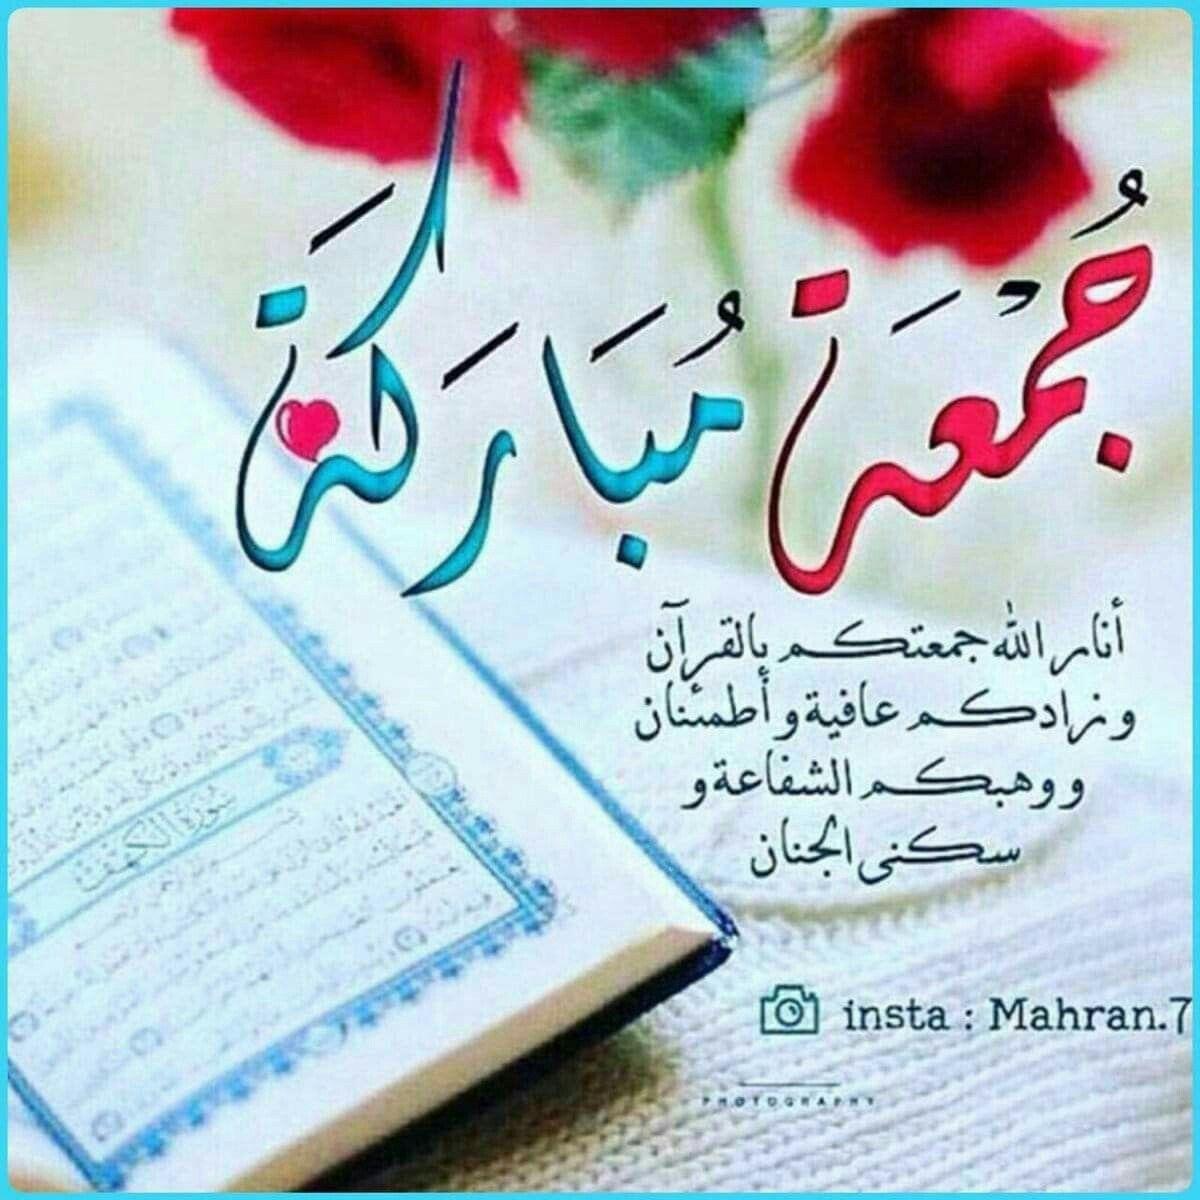 Pin By Saja Khalid On جمعه مباركه Islamic Caligraphy Art Caligraphy Art Modern Calligraphy Fonts